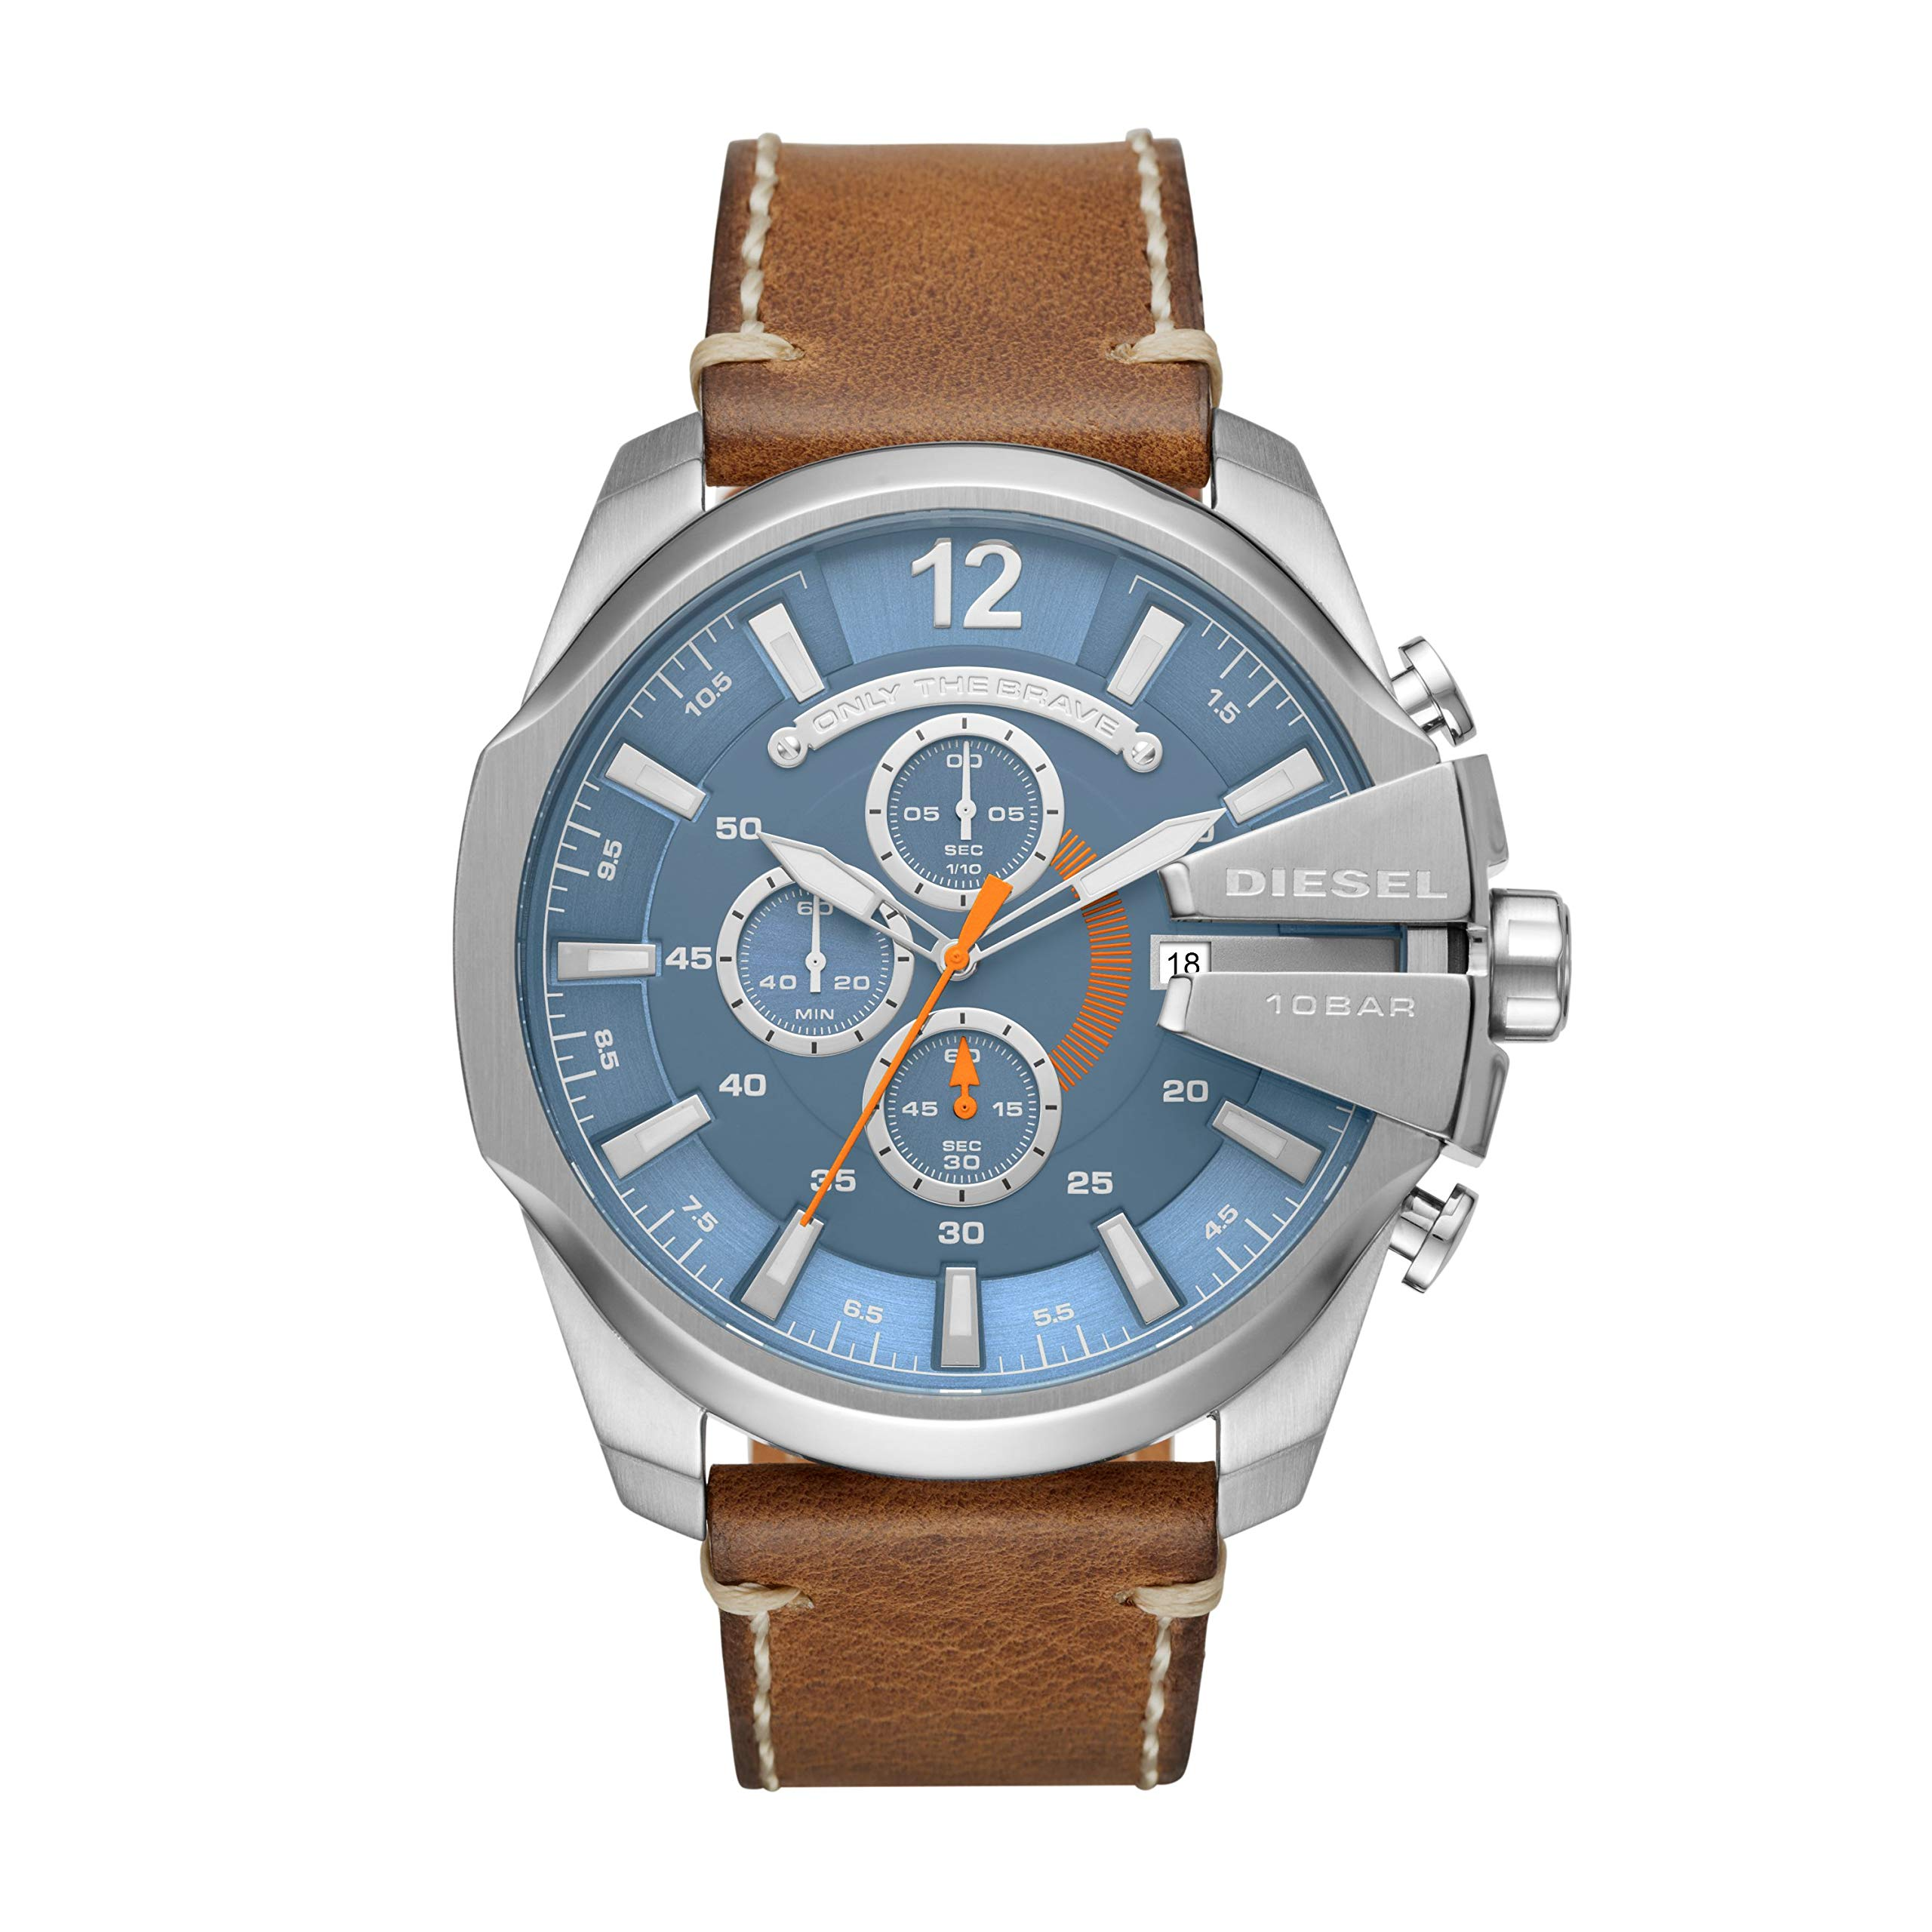 Diesel Men's Mega Chief Stainless Steel Japanese-Quartz Watch with Leather Calfskin Strap, Brown, 26 (Model: DZ4458)